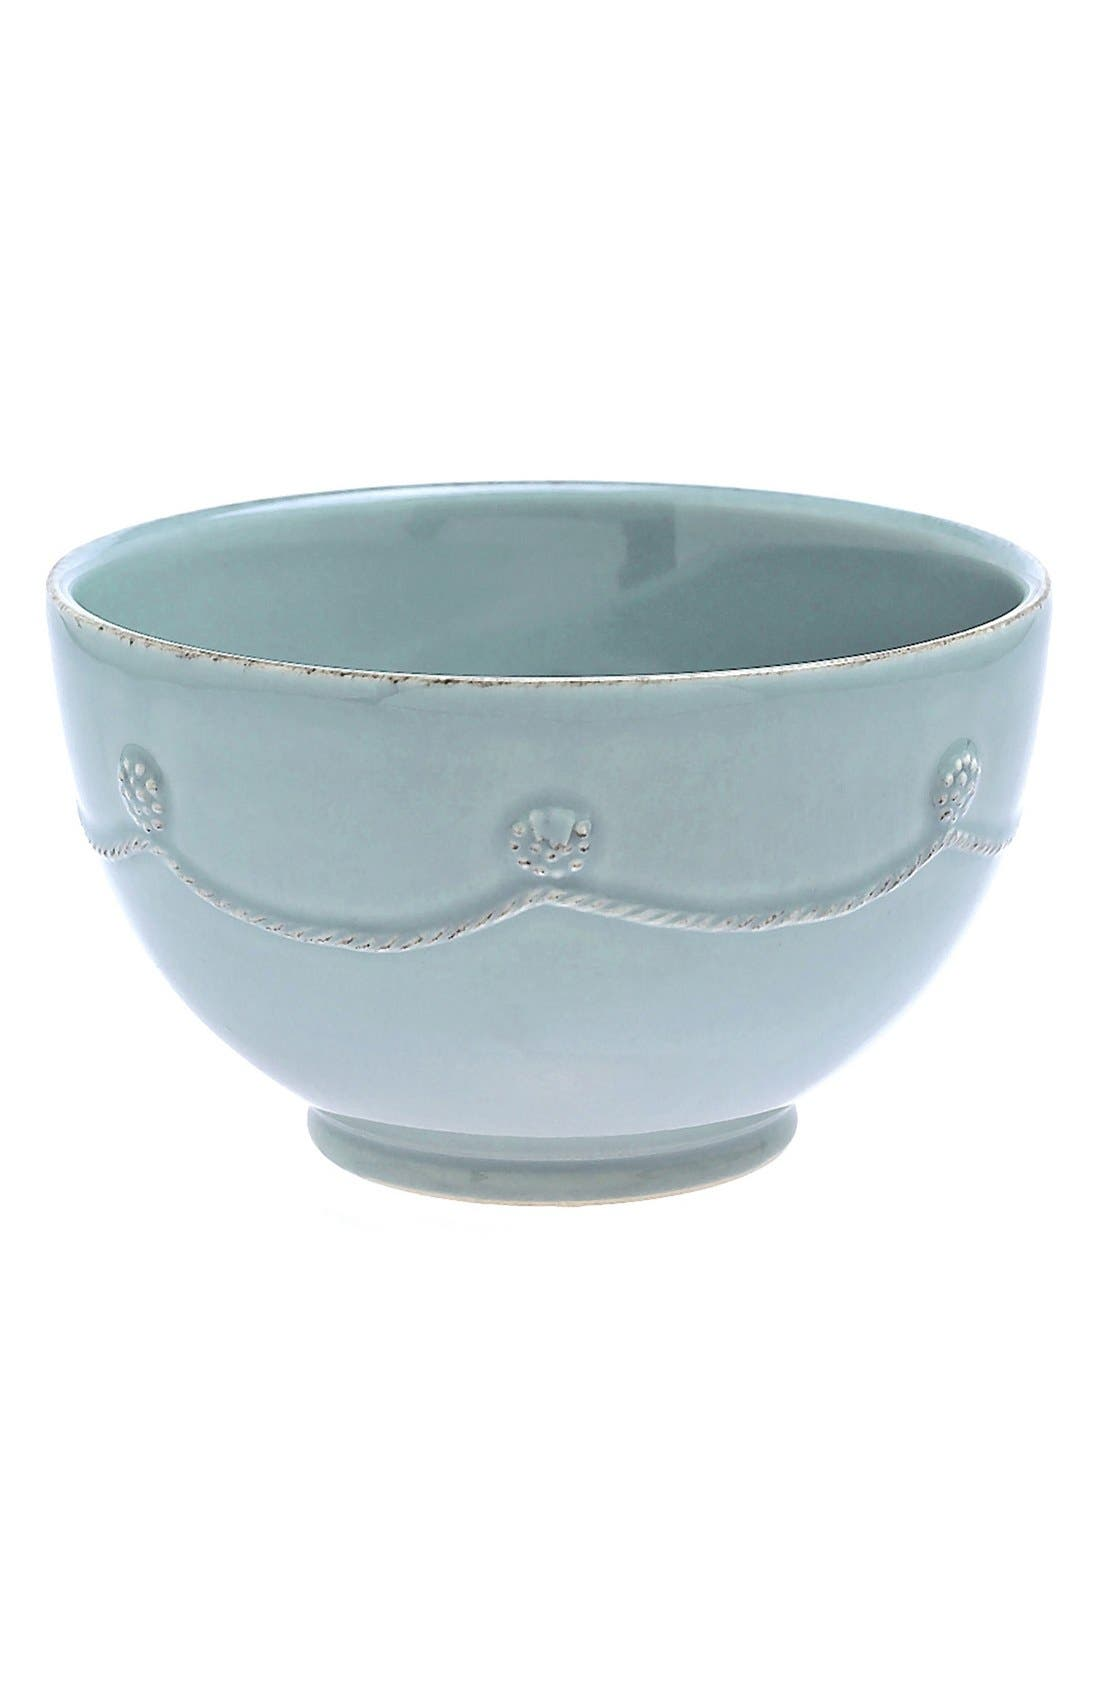 Juliska'Berry and Thread' Soup Bowl